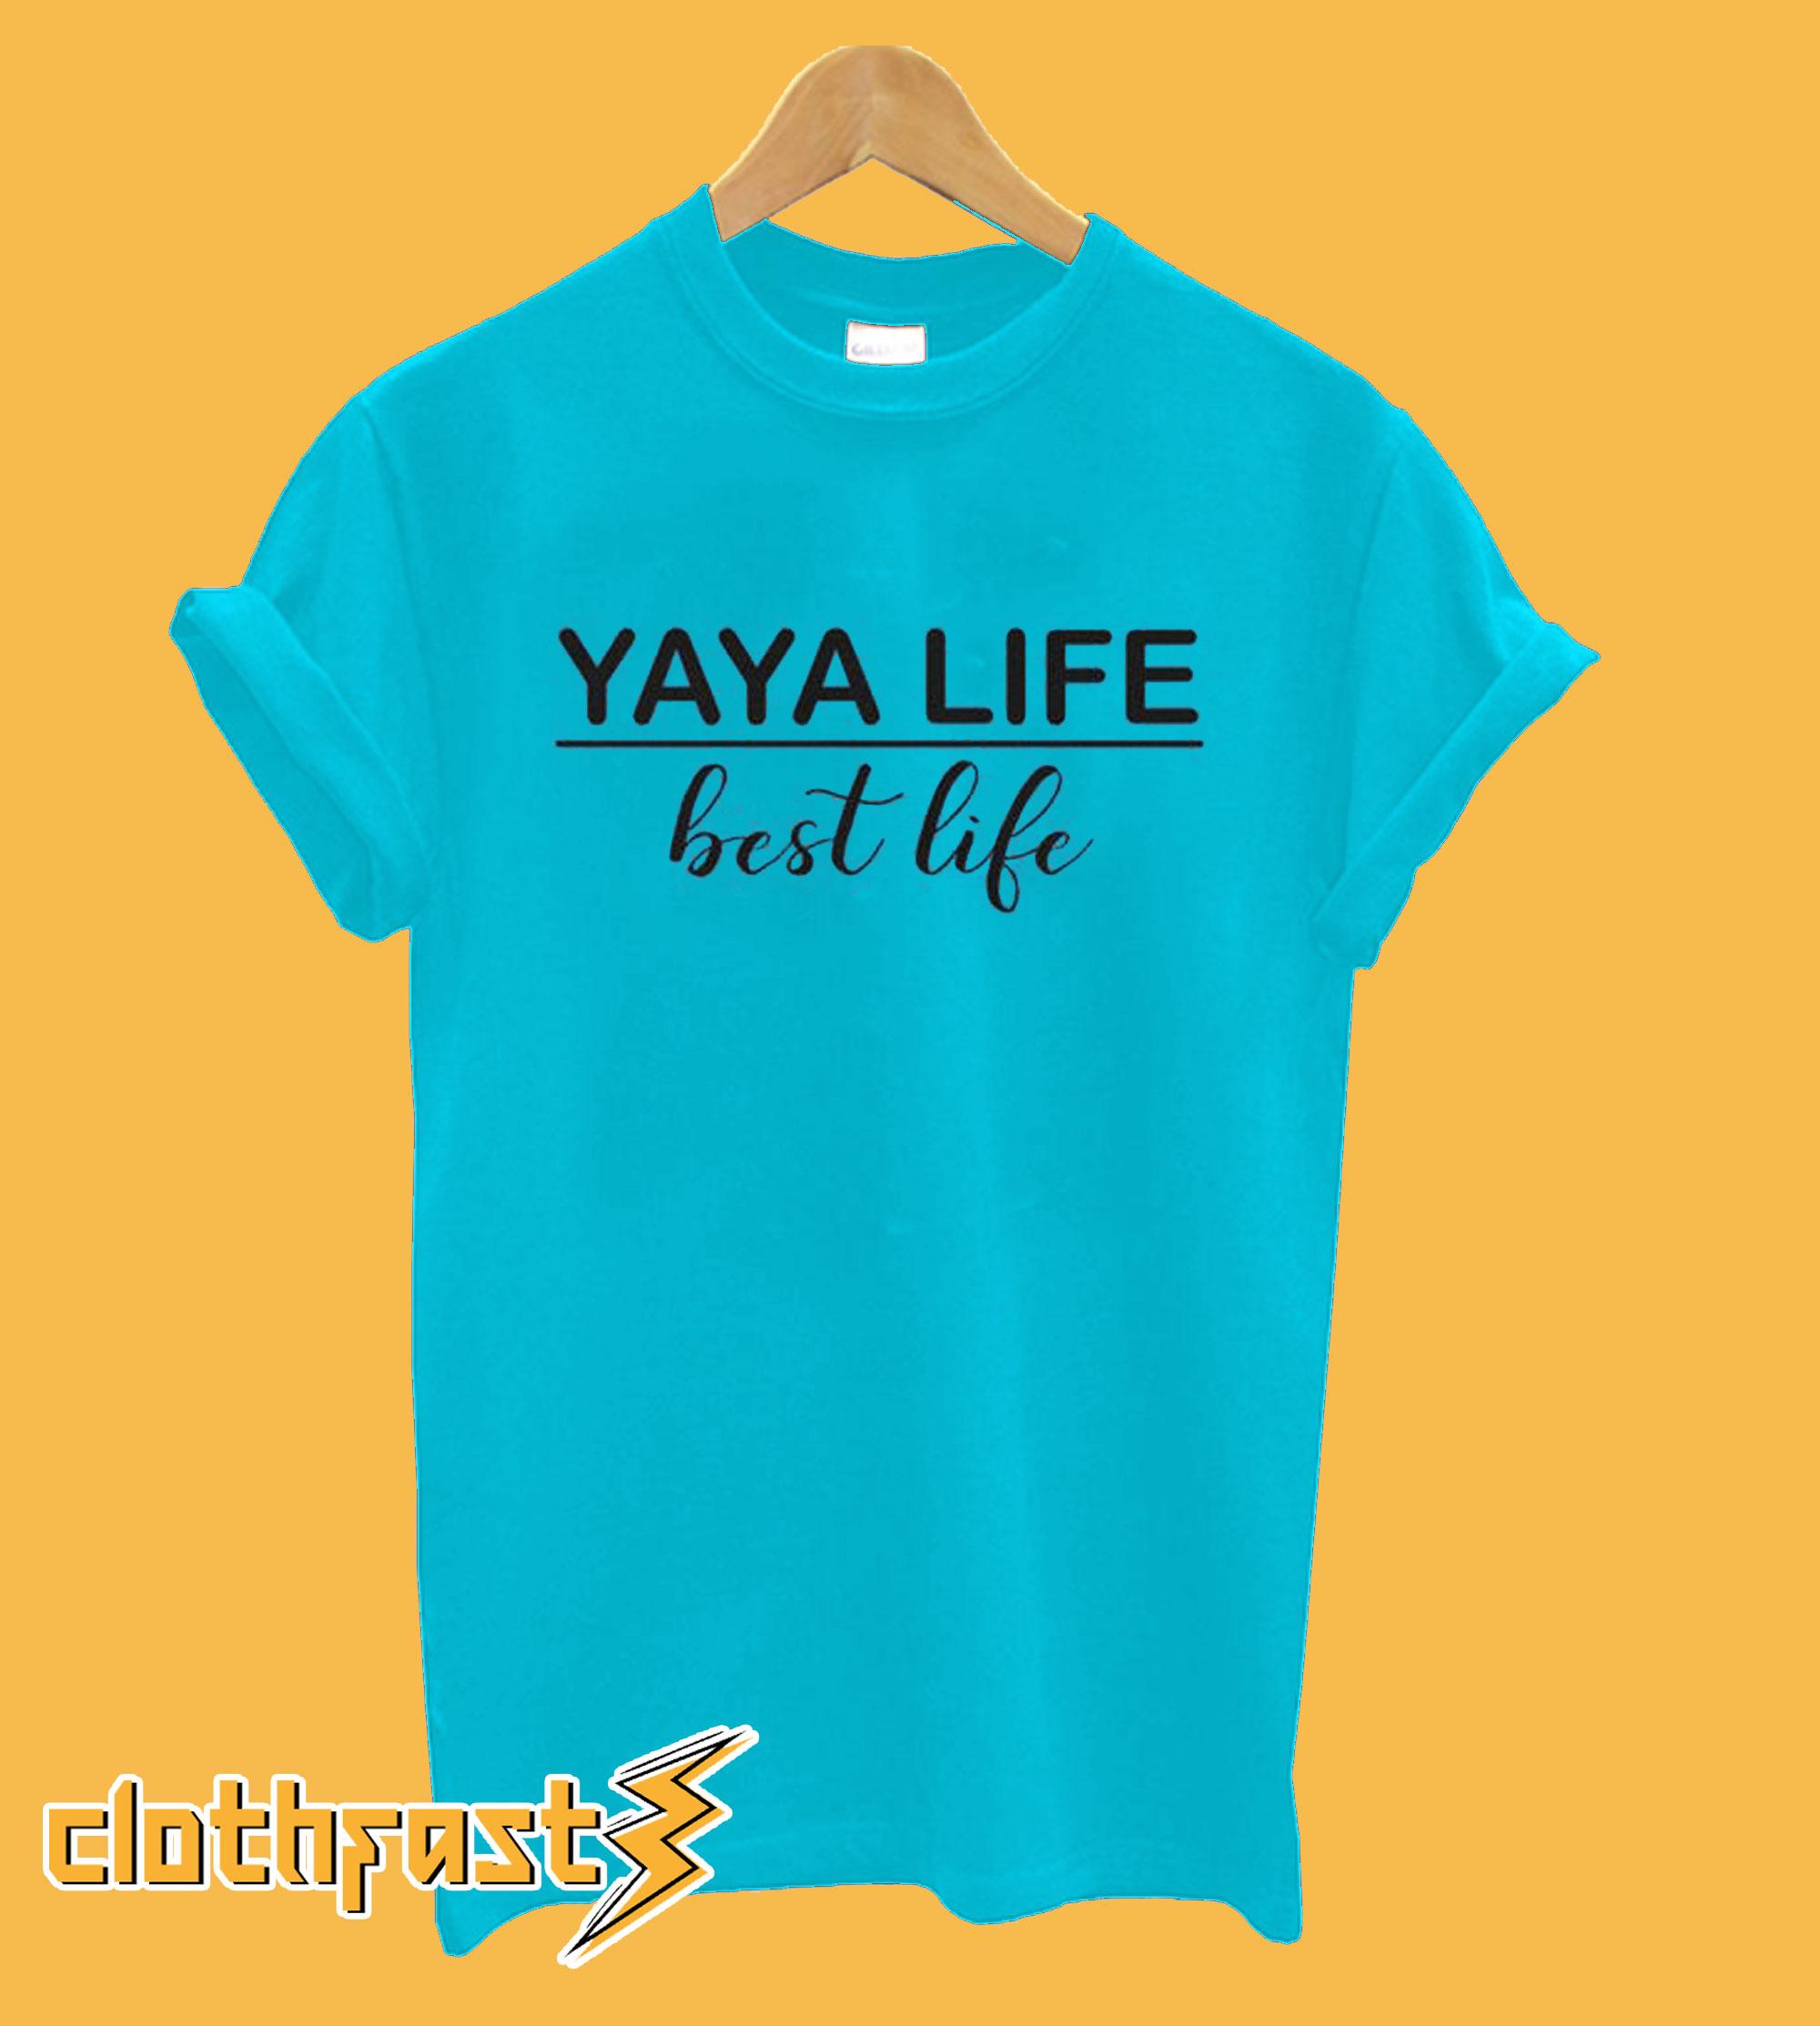 YAYA Life Best Life T-Shirt